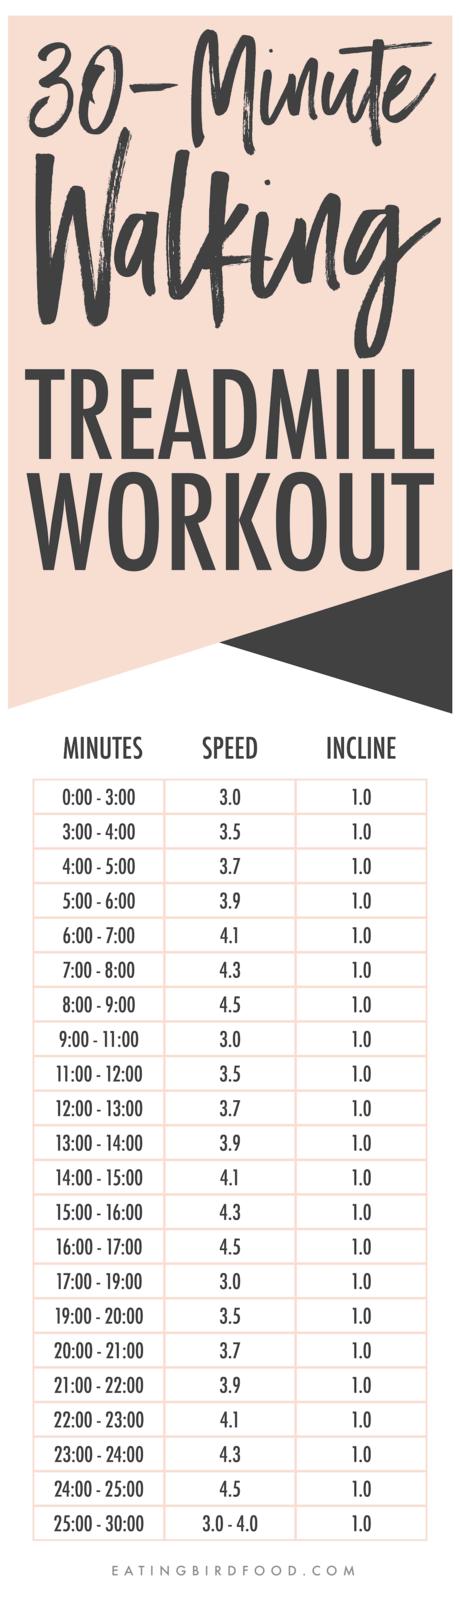 30-Minute Walking Treadmill Workout